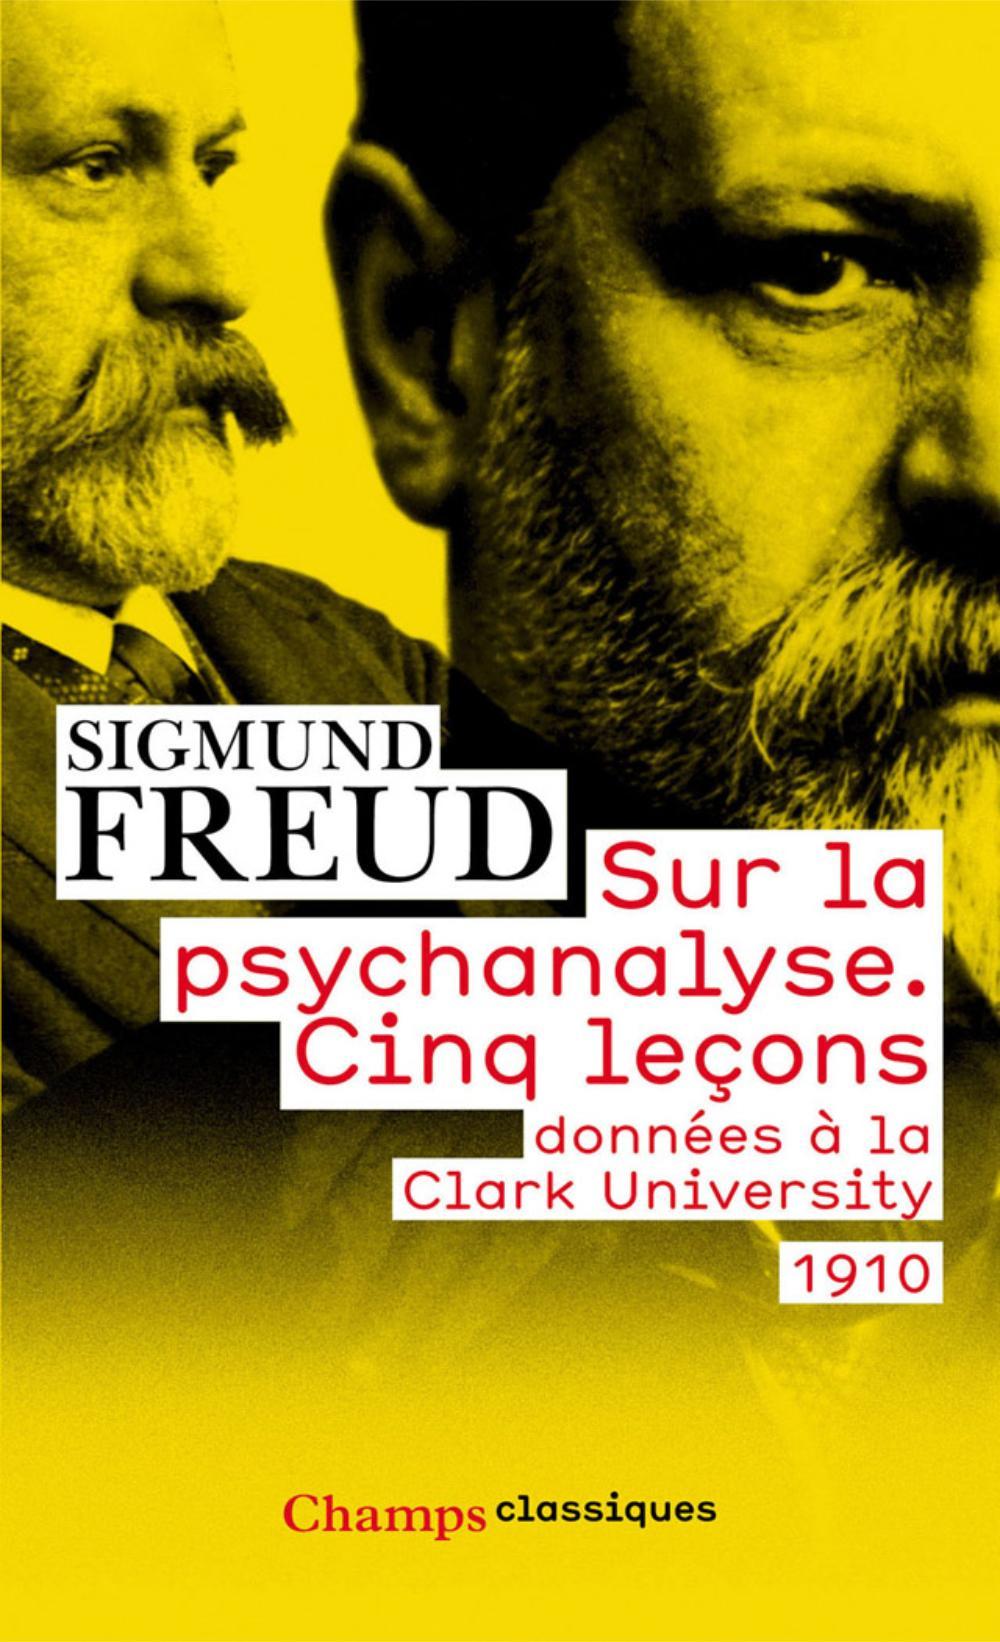 Sigmund Freud - Cinq Leçons Sur La Psychanalyse